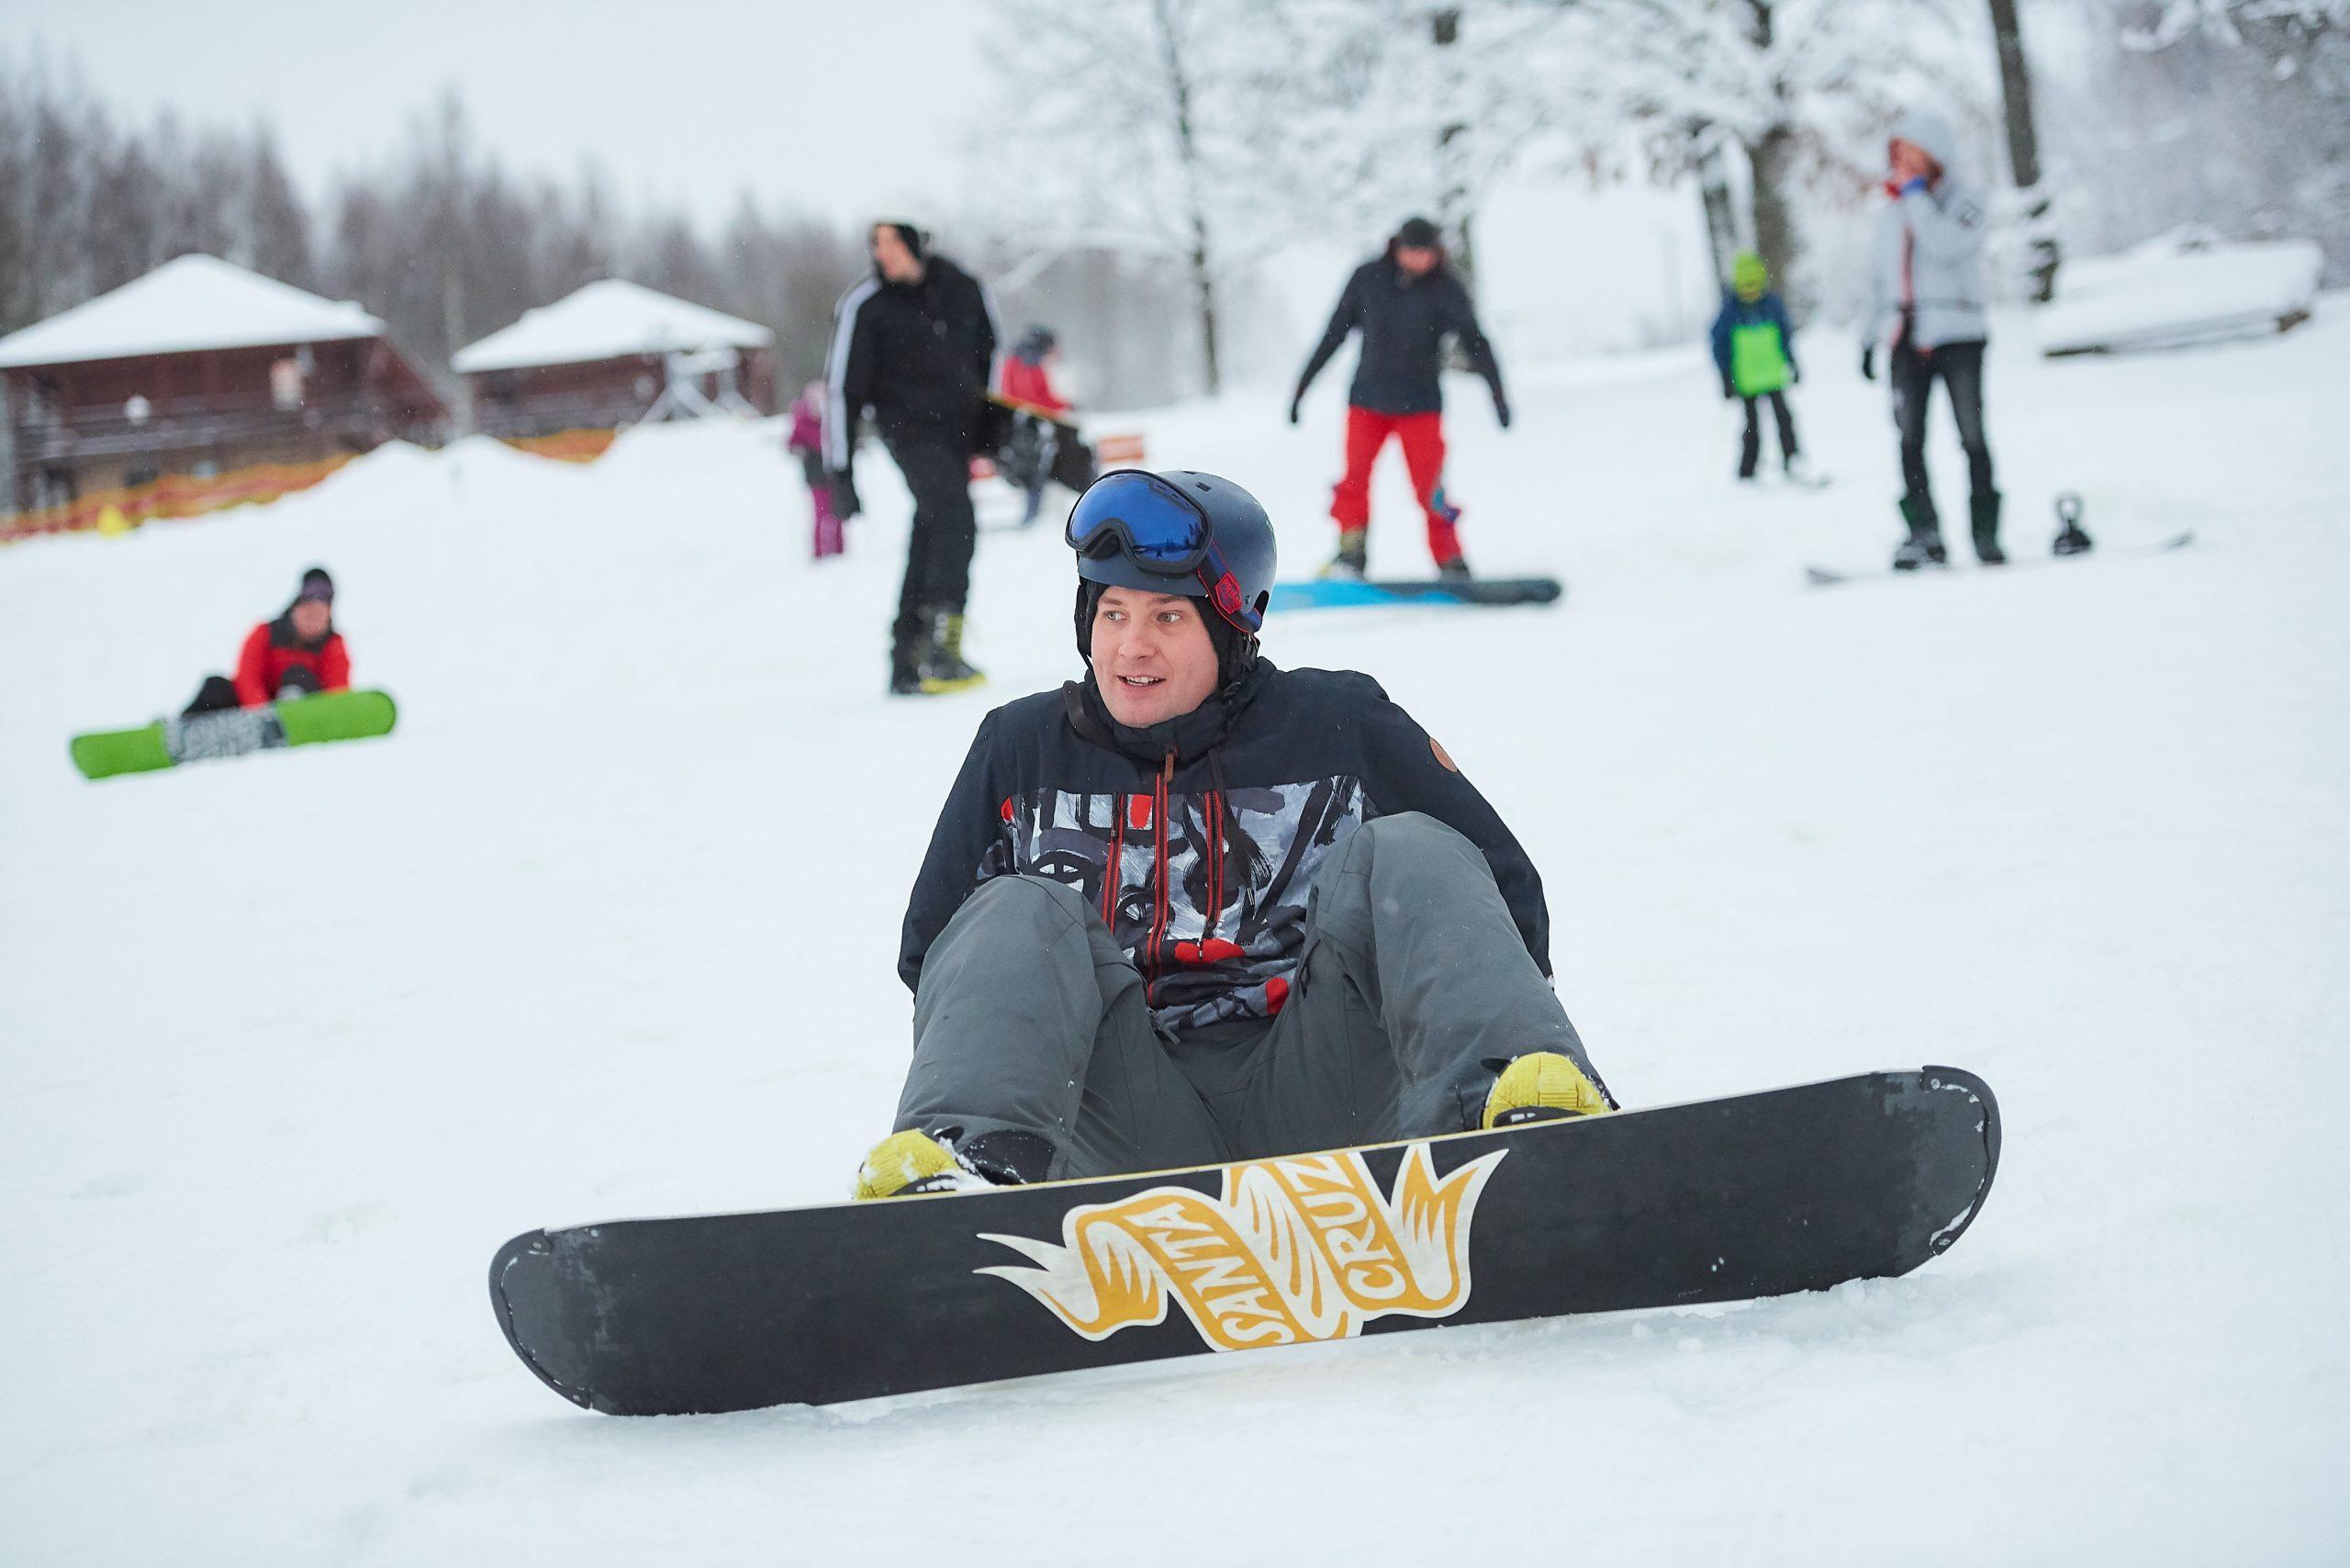 Developer is snowboarding at team-building